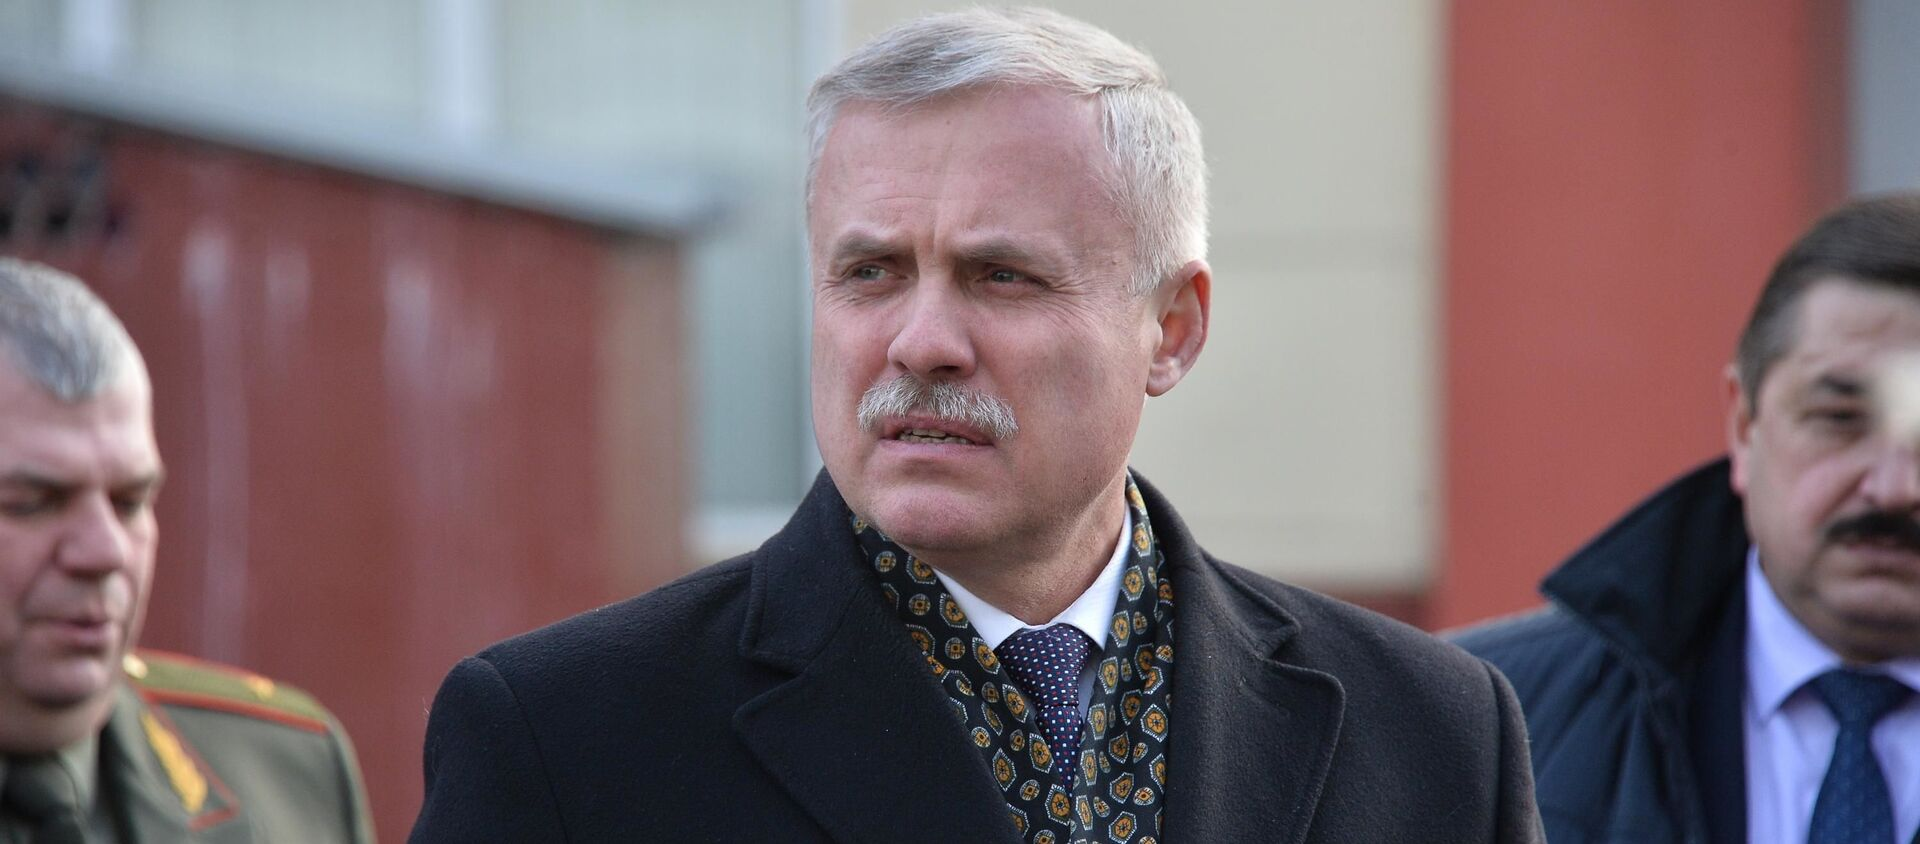 Председатель Совета безопасности Беларуси Станислав Зась - Sputnik Беларусь, 1920, 02.02.2021